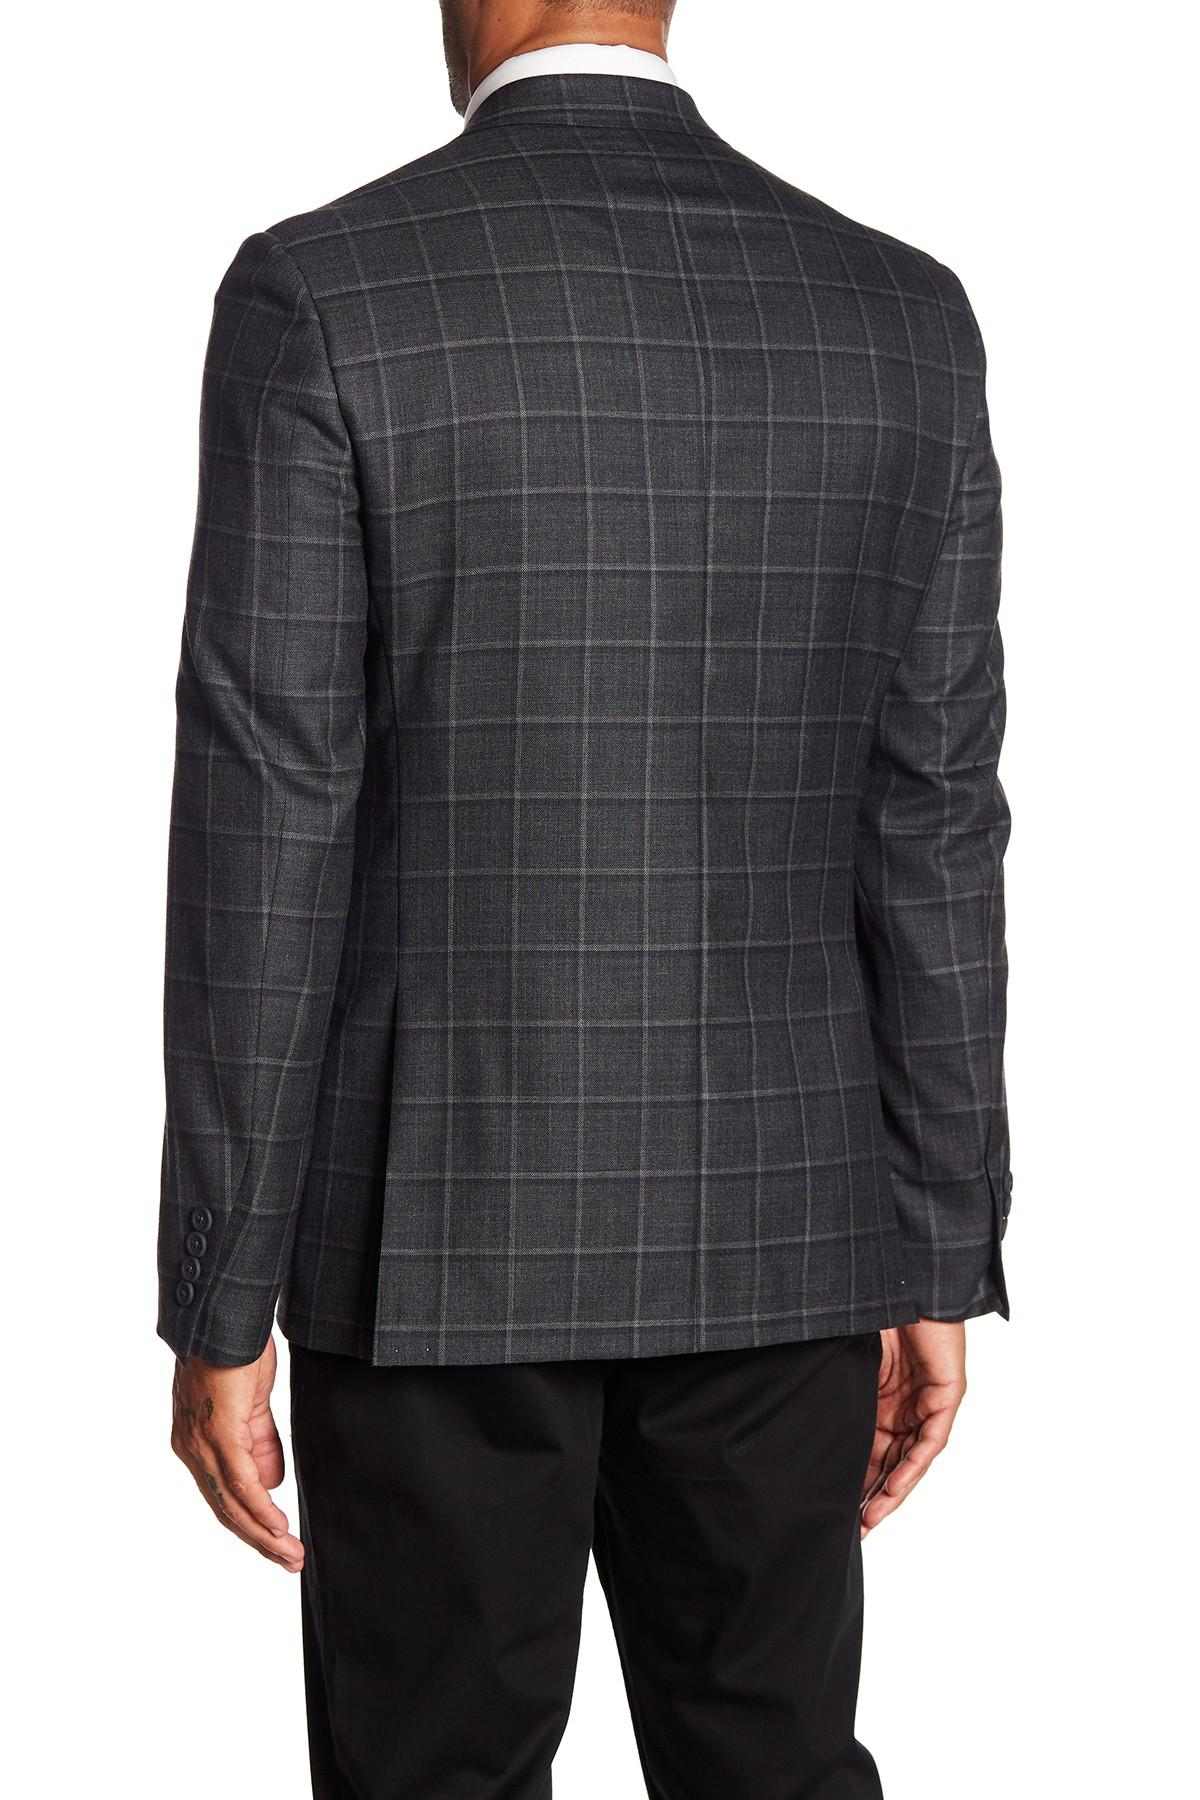 c22d90801ca Lyst - Nordstrom Trim Fit Windowpane Wool Sport Coat in Gray for Men